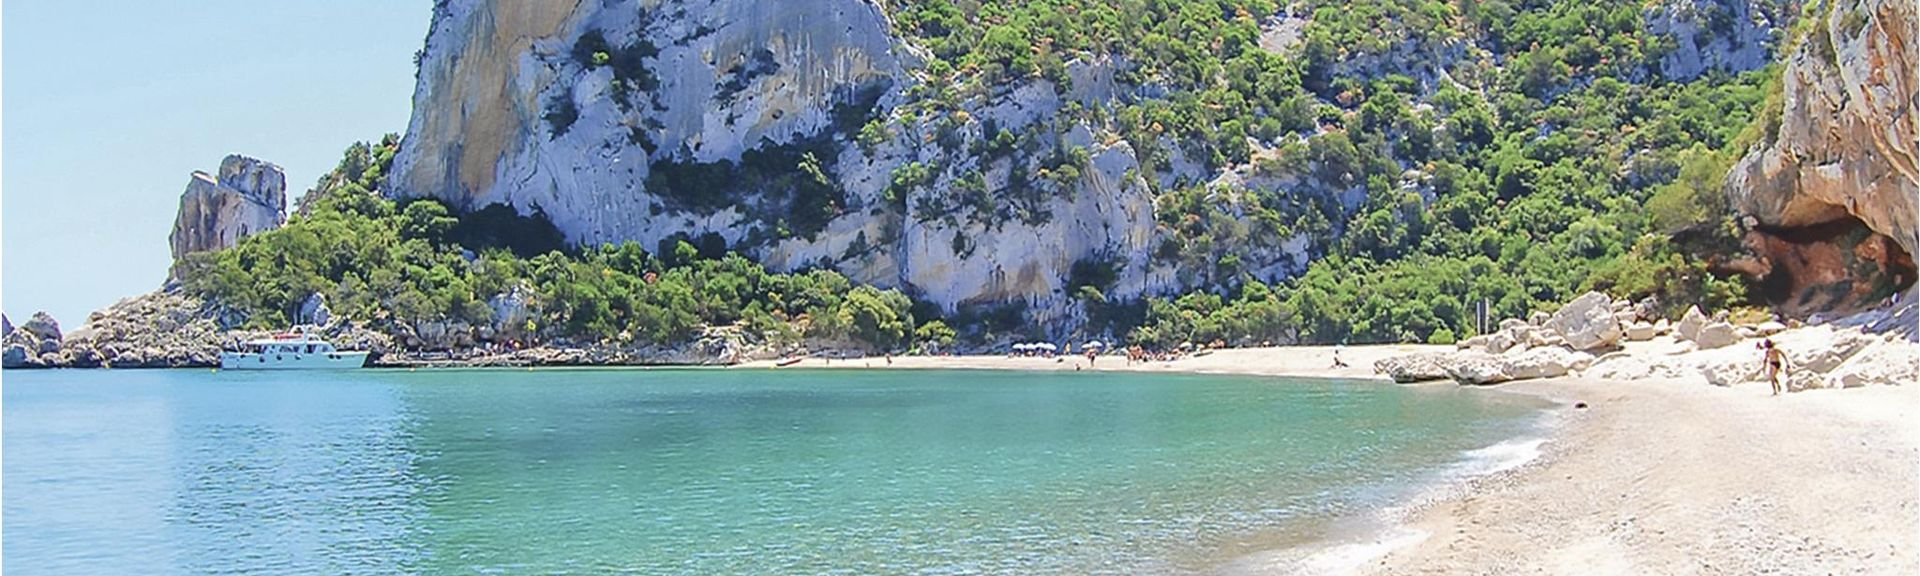 Cala Gonone, Dorgali, Sardinia, Italy